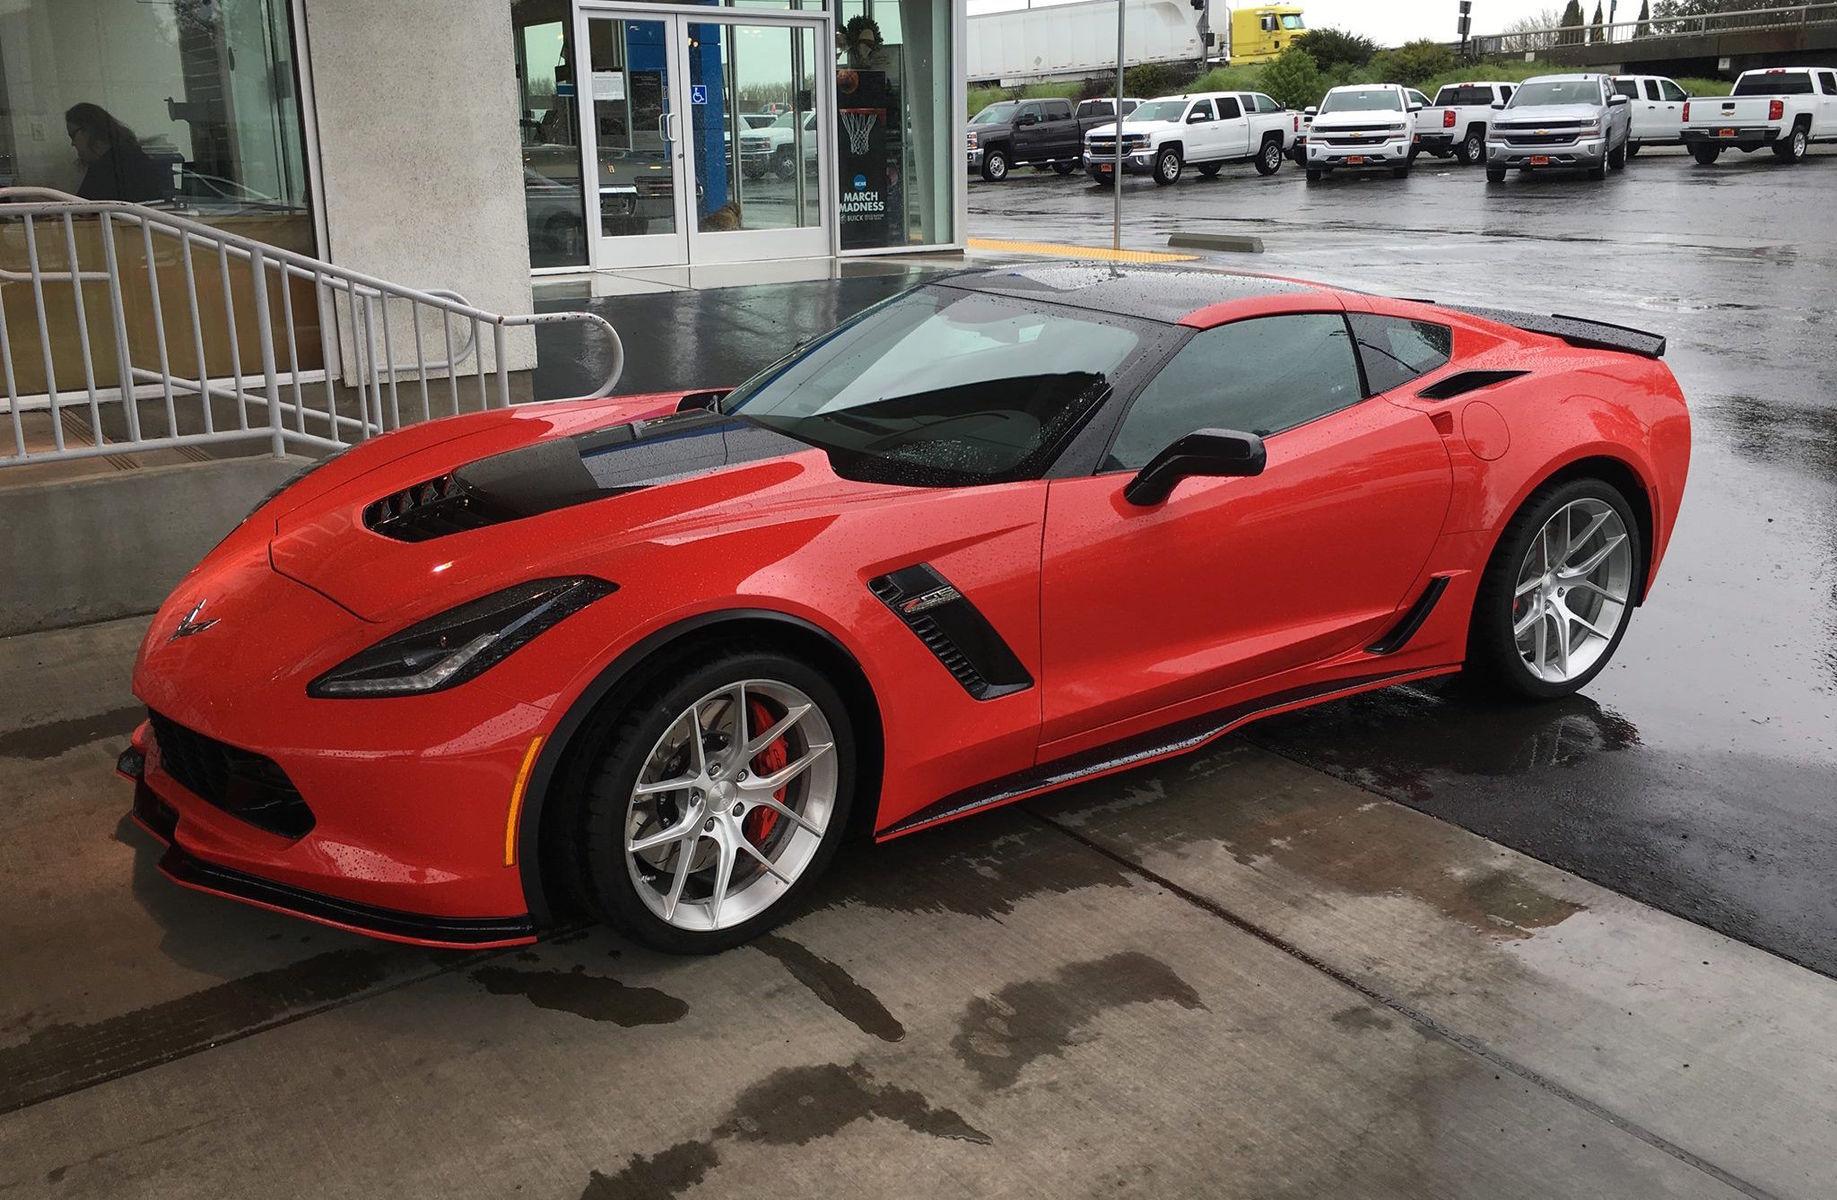 2016 Chevrolet Corvette Z06 | Red Chevrolet C7 Corvette Z06 on Forgeline One Piece Forged Monoblock VX1 Wheels